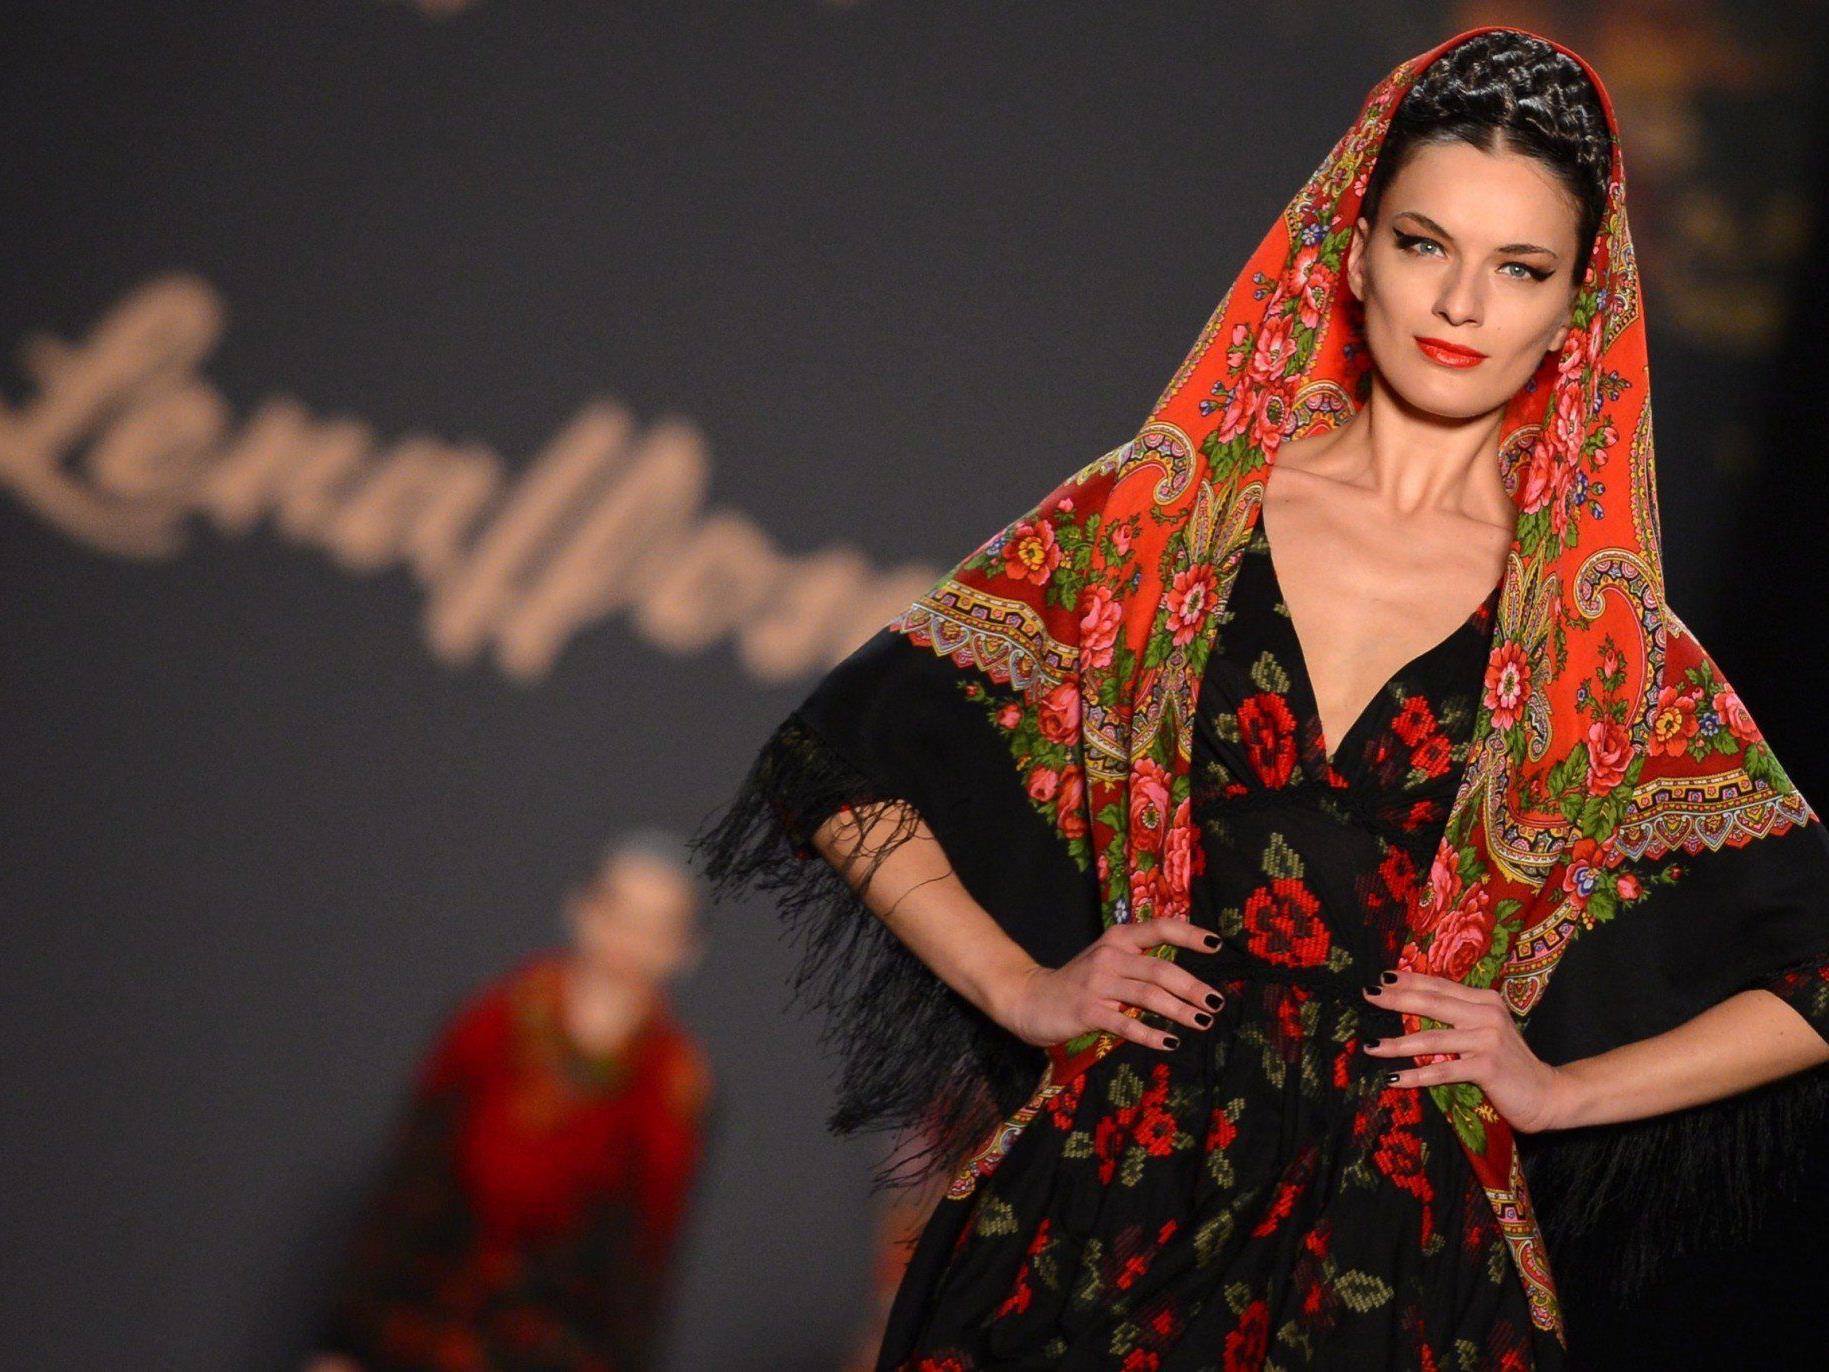 eaaf7bd1803f Berliner Modewoche  Show von Lena Hoschek fand im Anschluss an  Eröffnungsschauen statt.